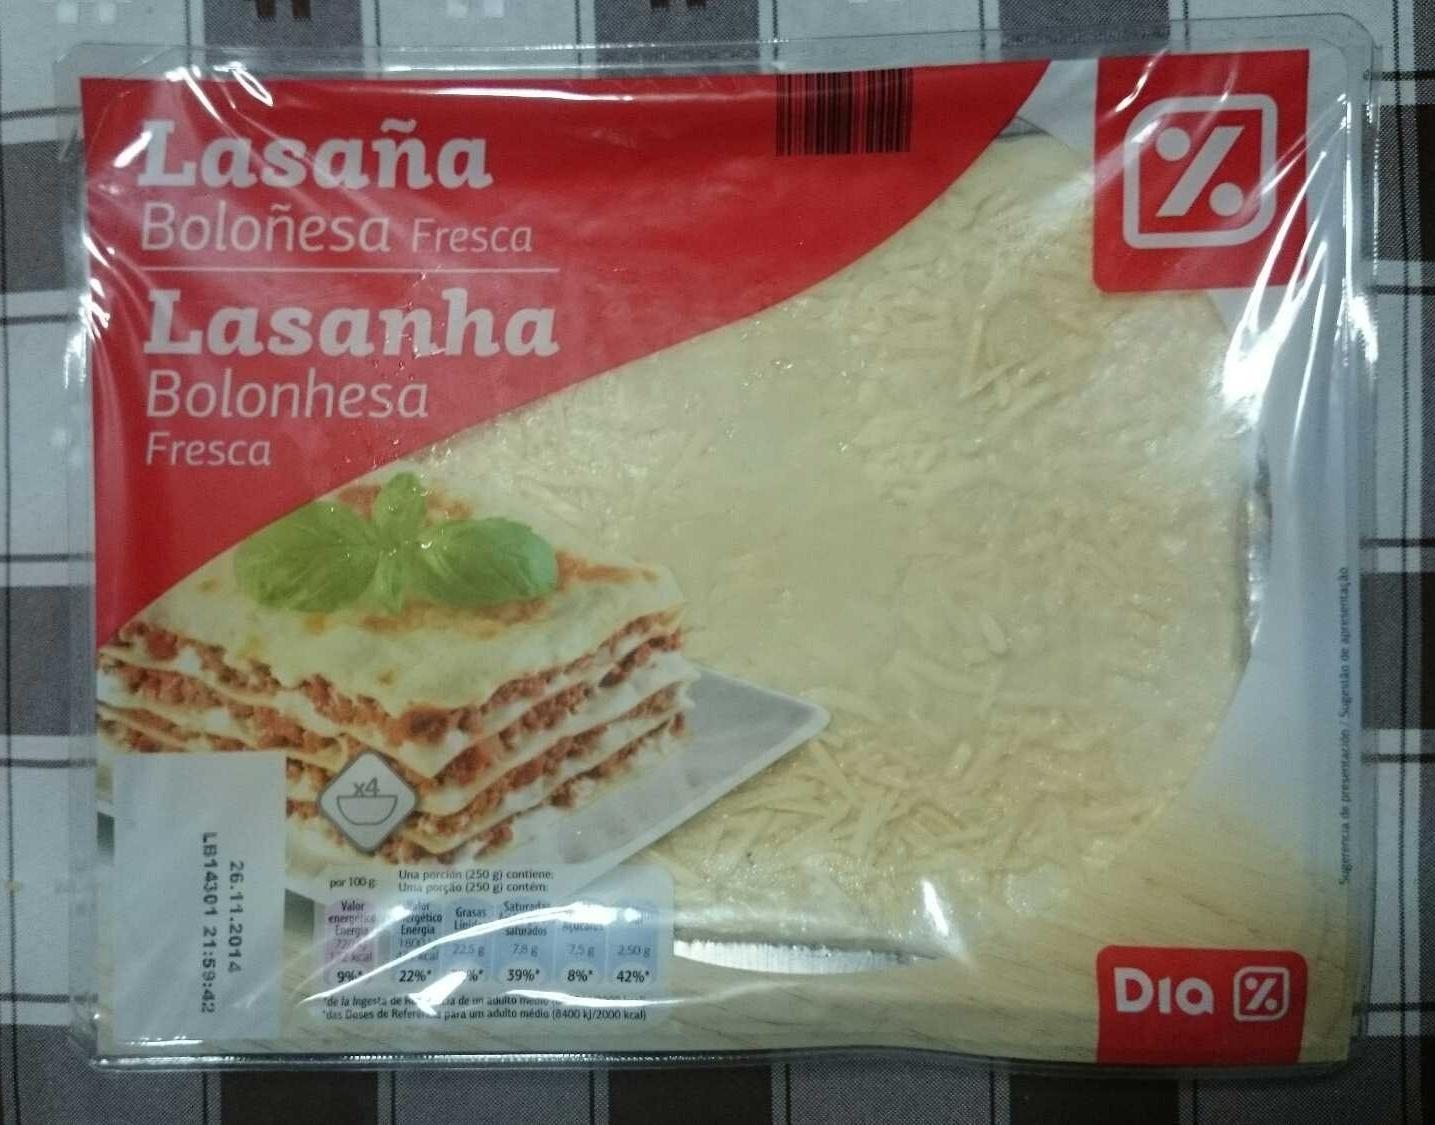 Lasanha Bolonhesa fresca - Product - pt